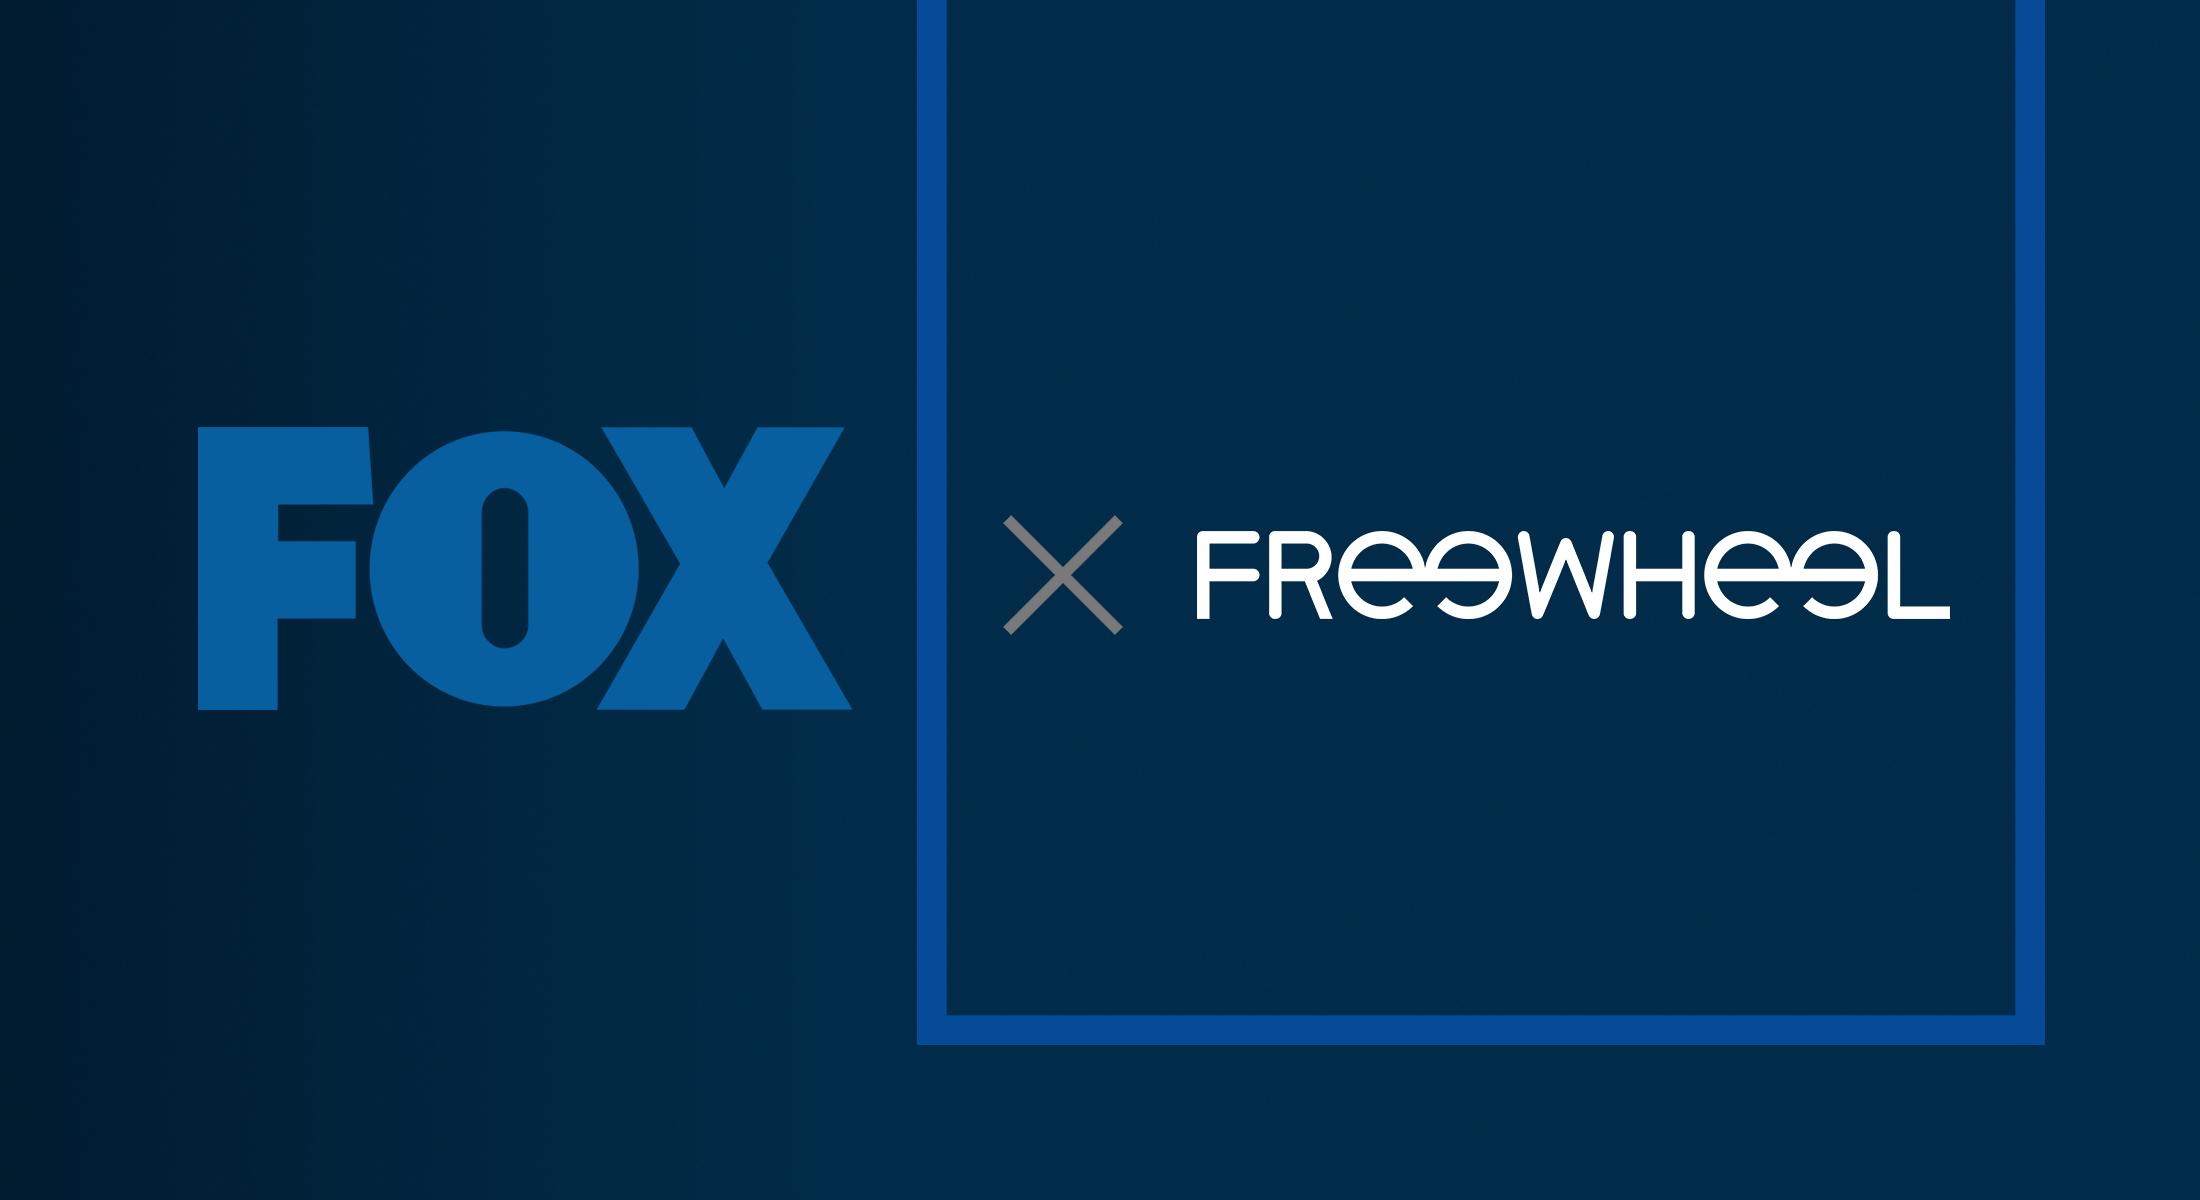 FOX x Freewheel Thought Leadership